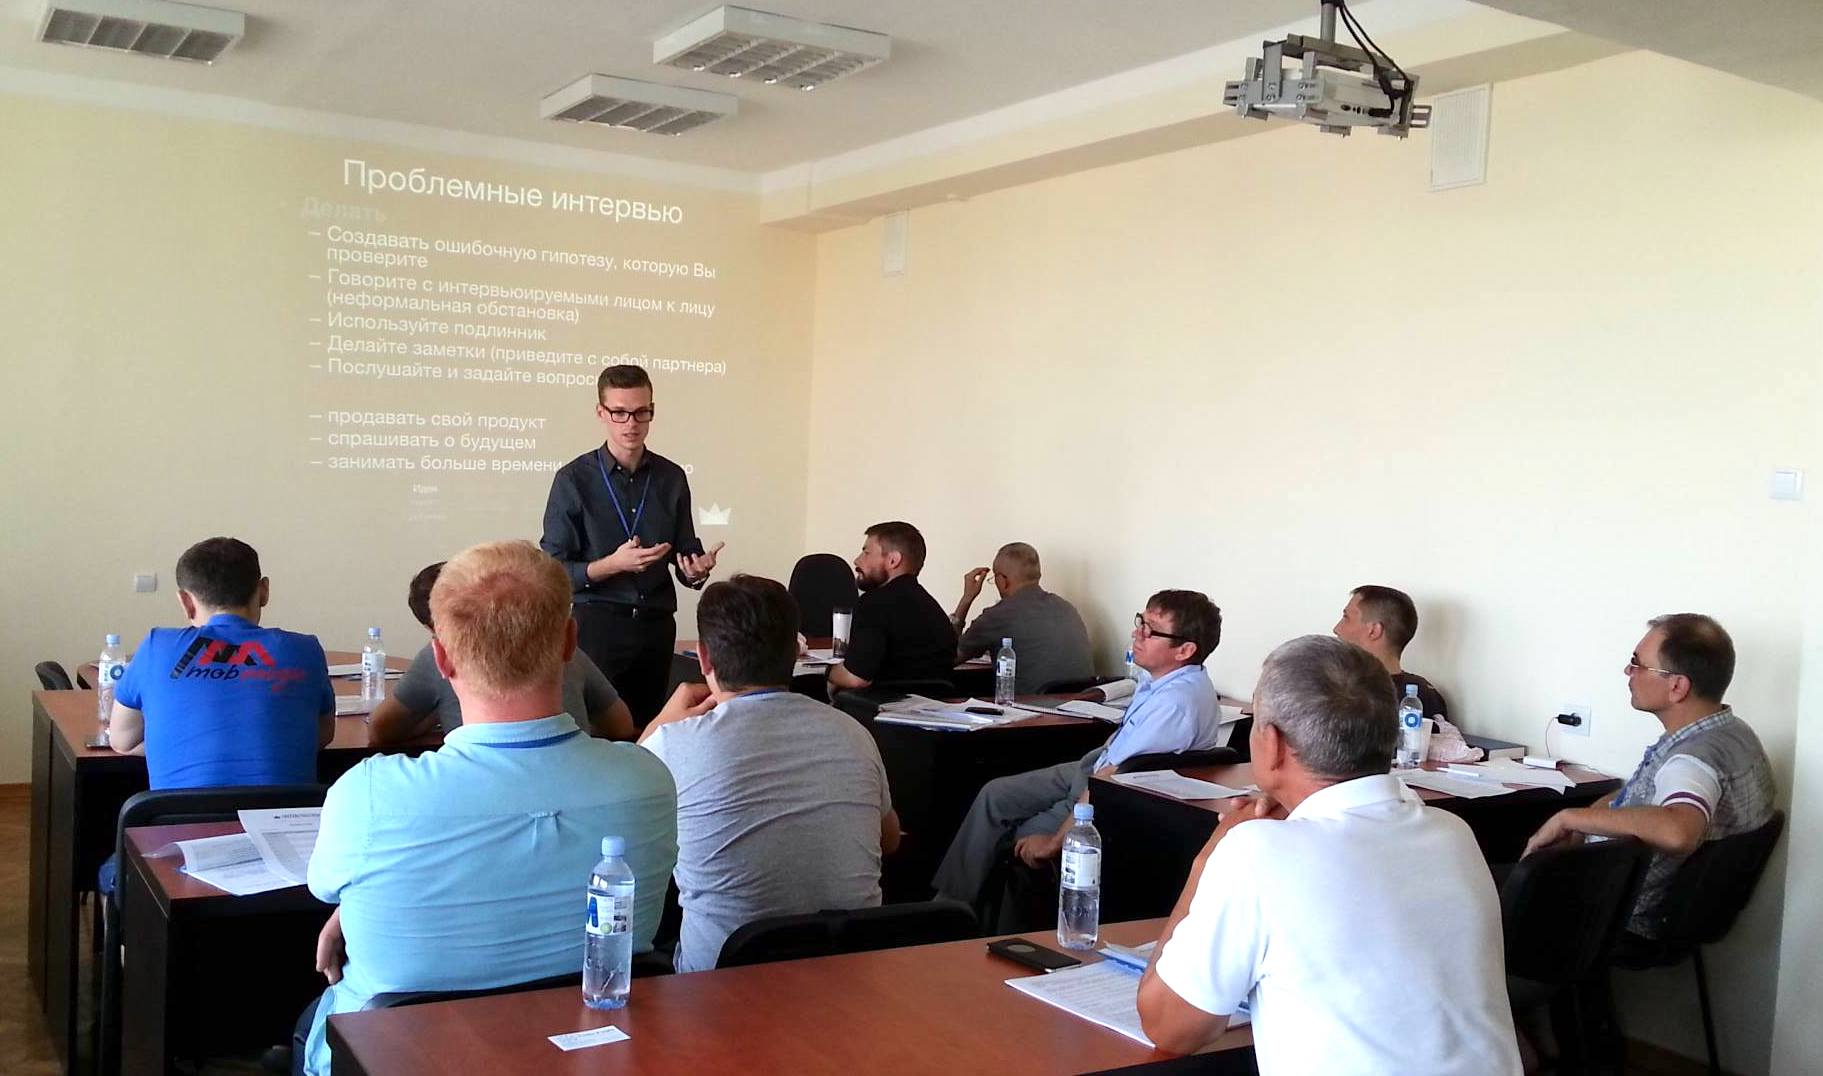 PW Accelerator 2016 Chisinau, MD